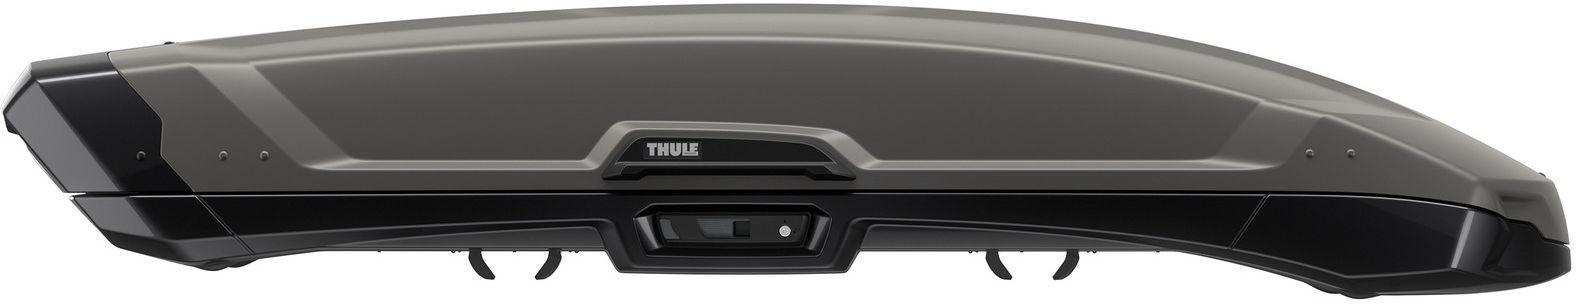 Thule Vector L Box dachowy Tytanowy Mat